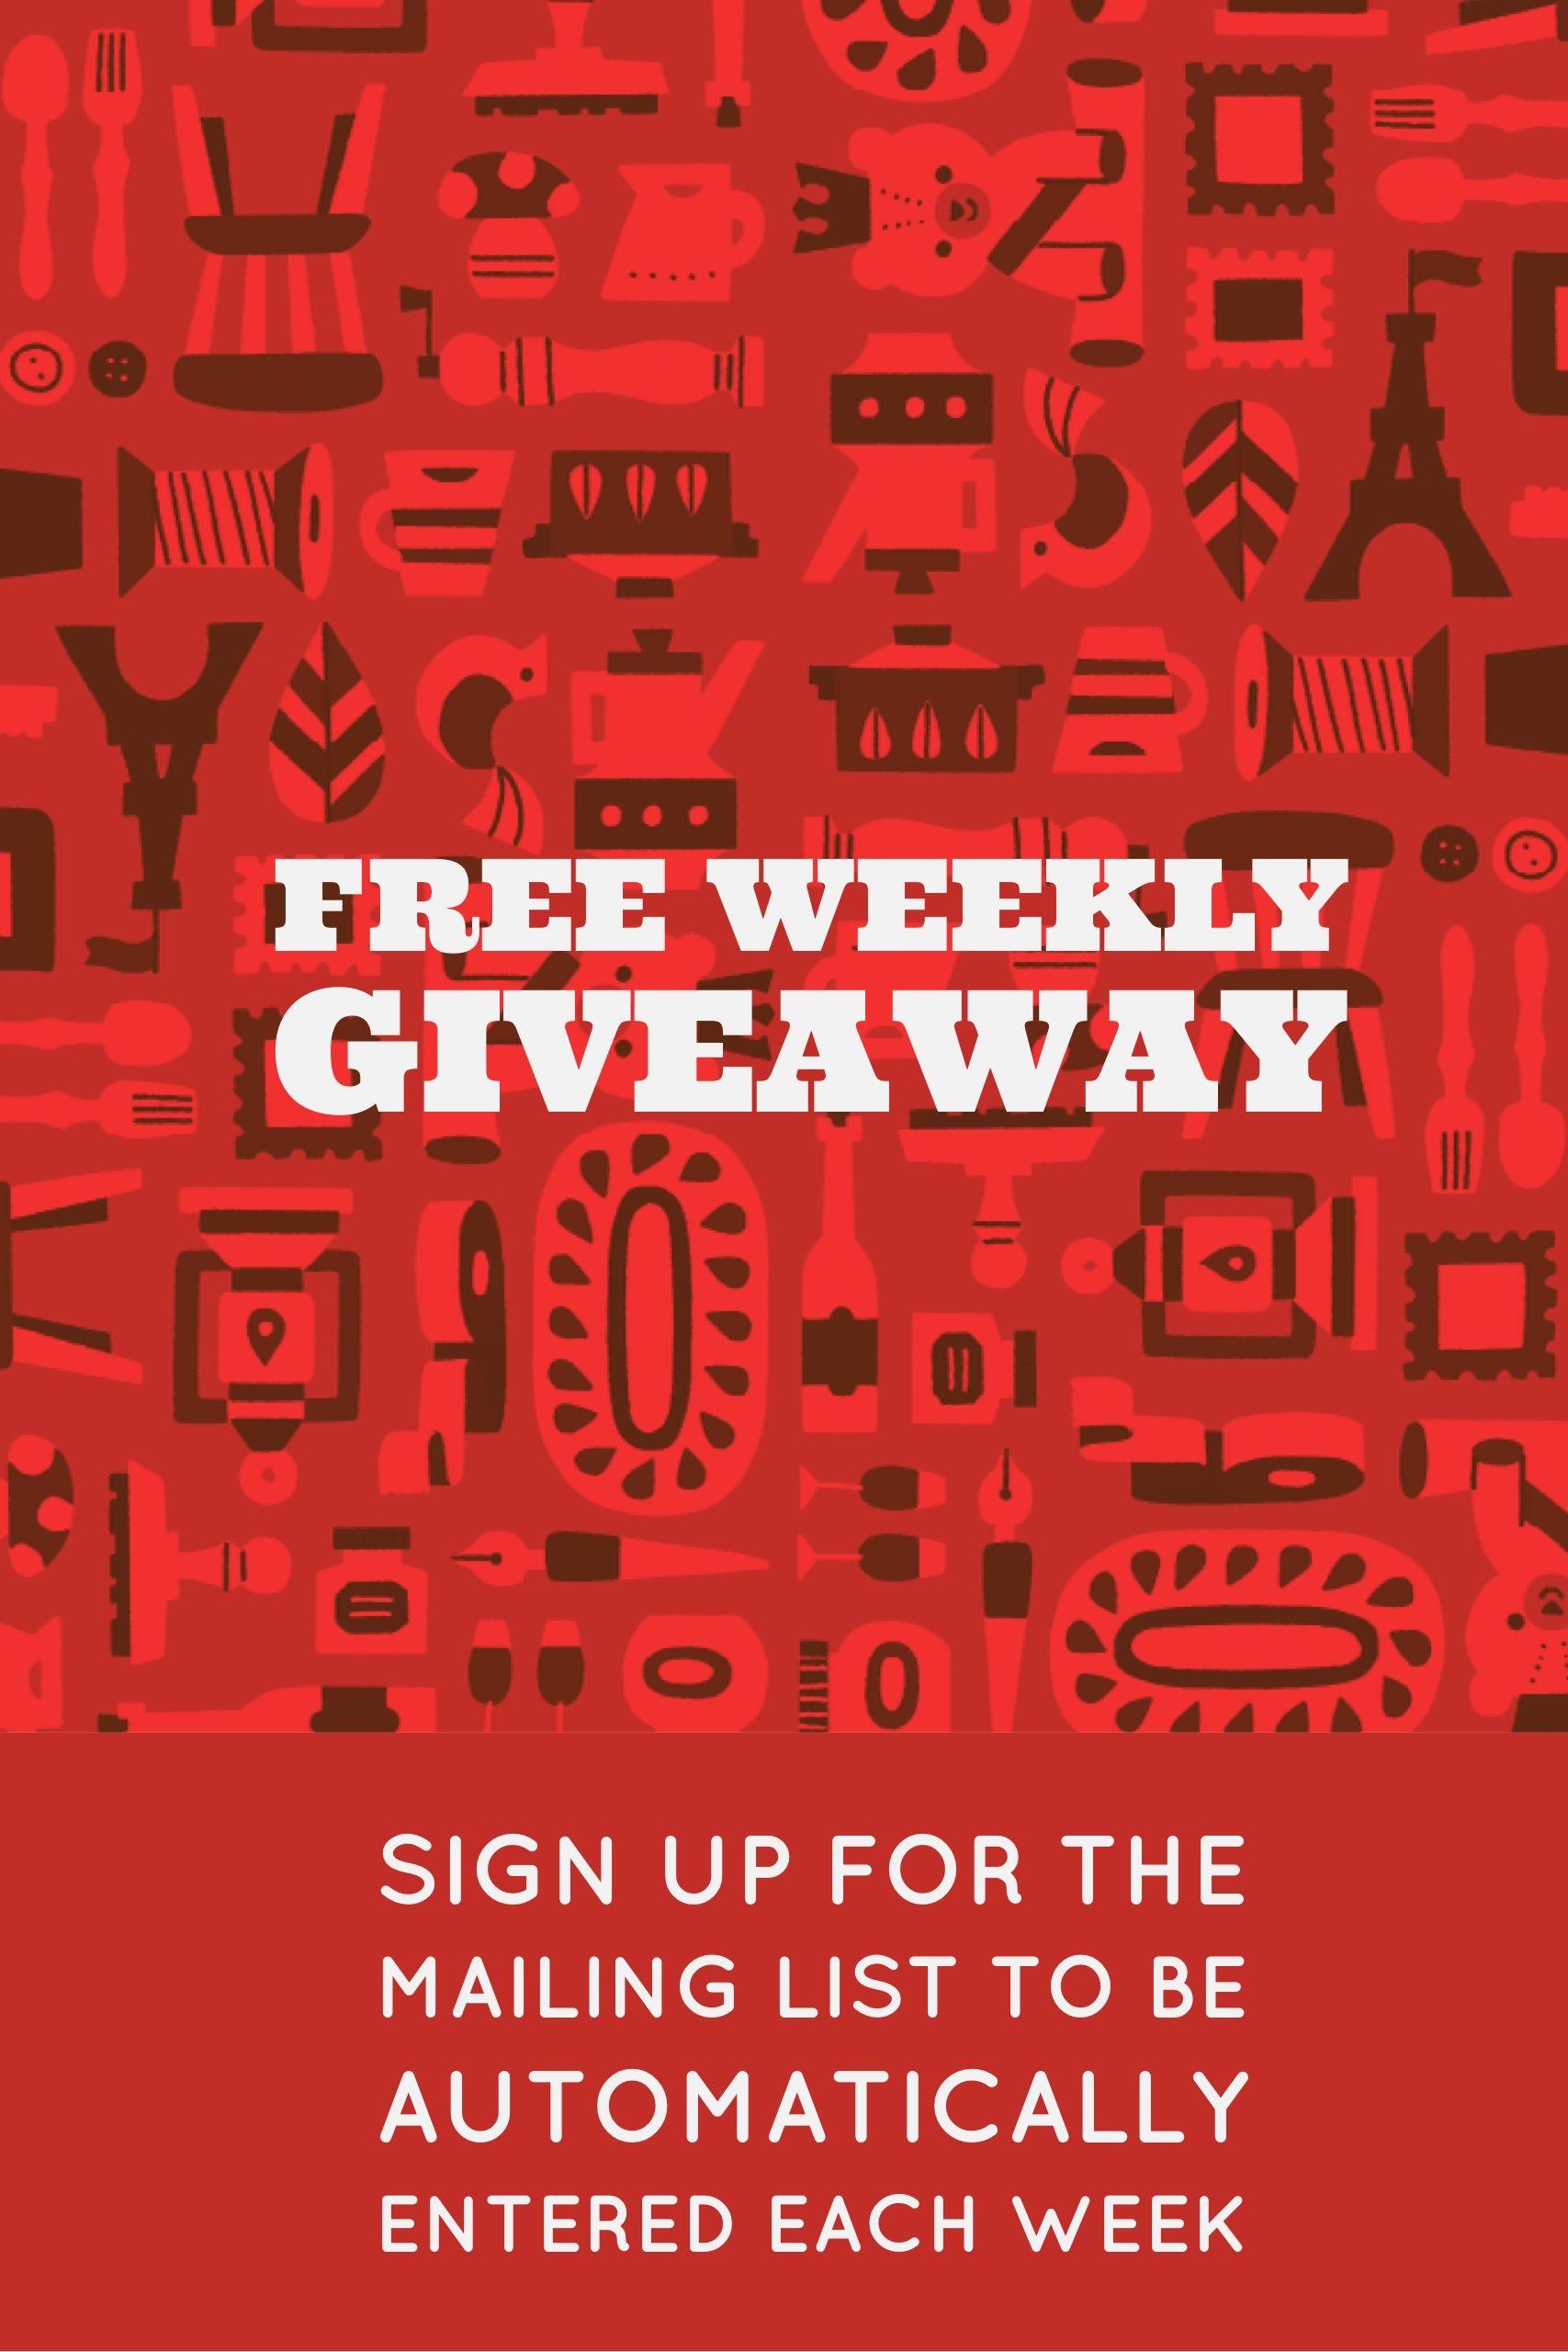 Blog Sign Up Free